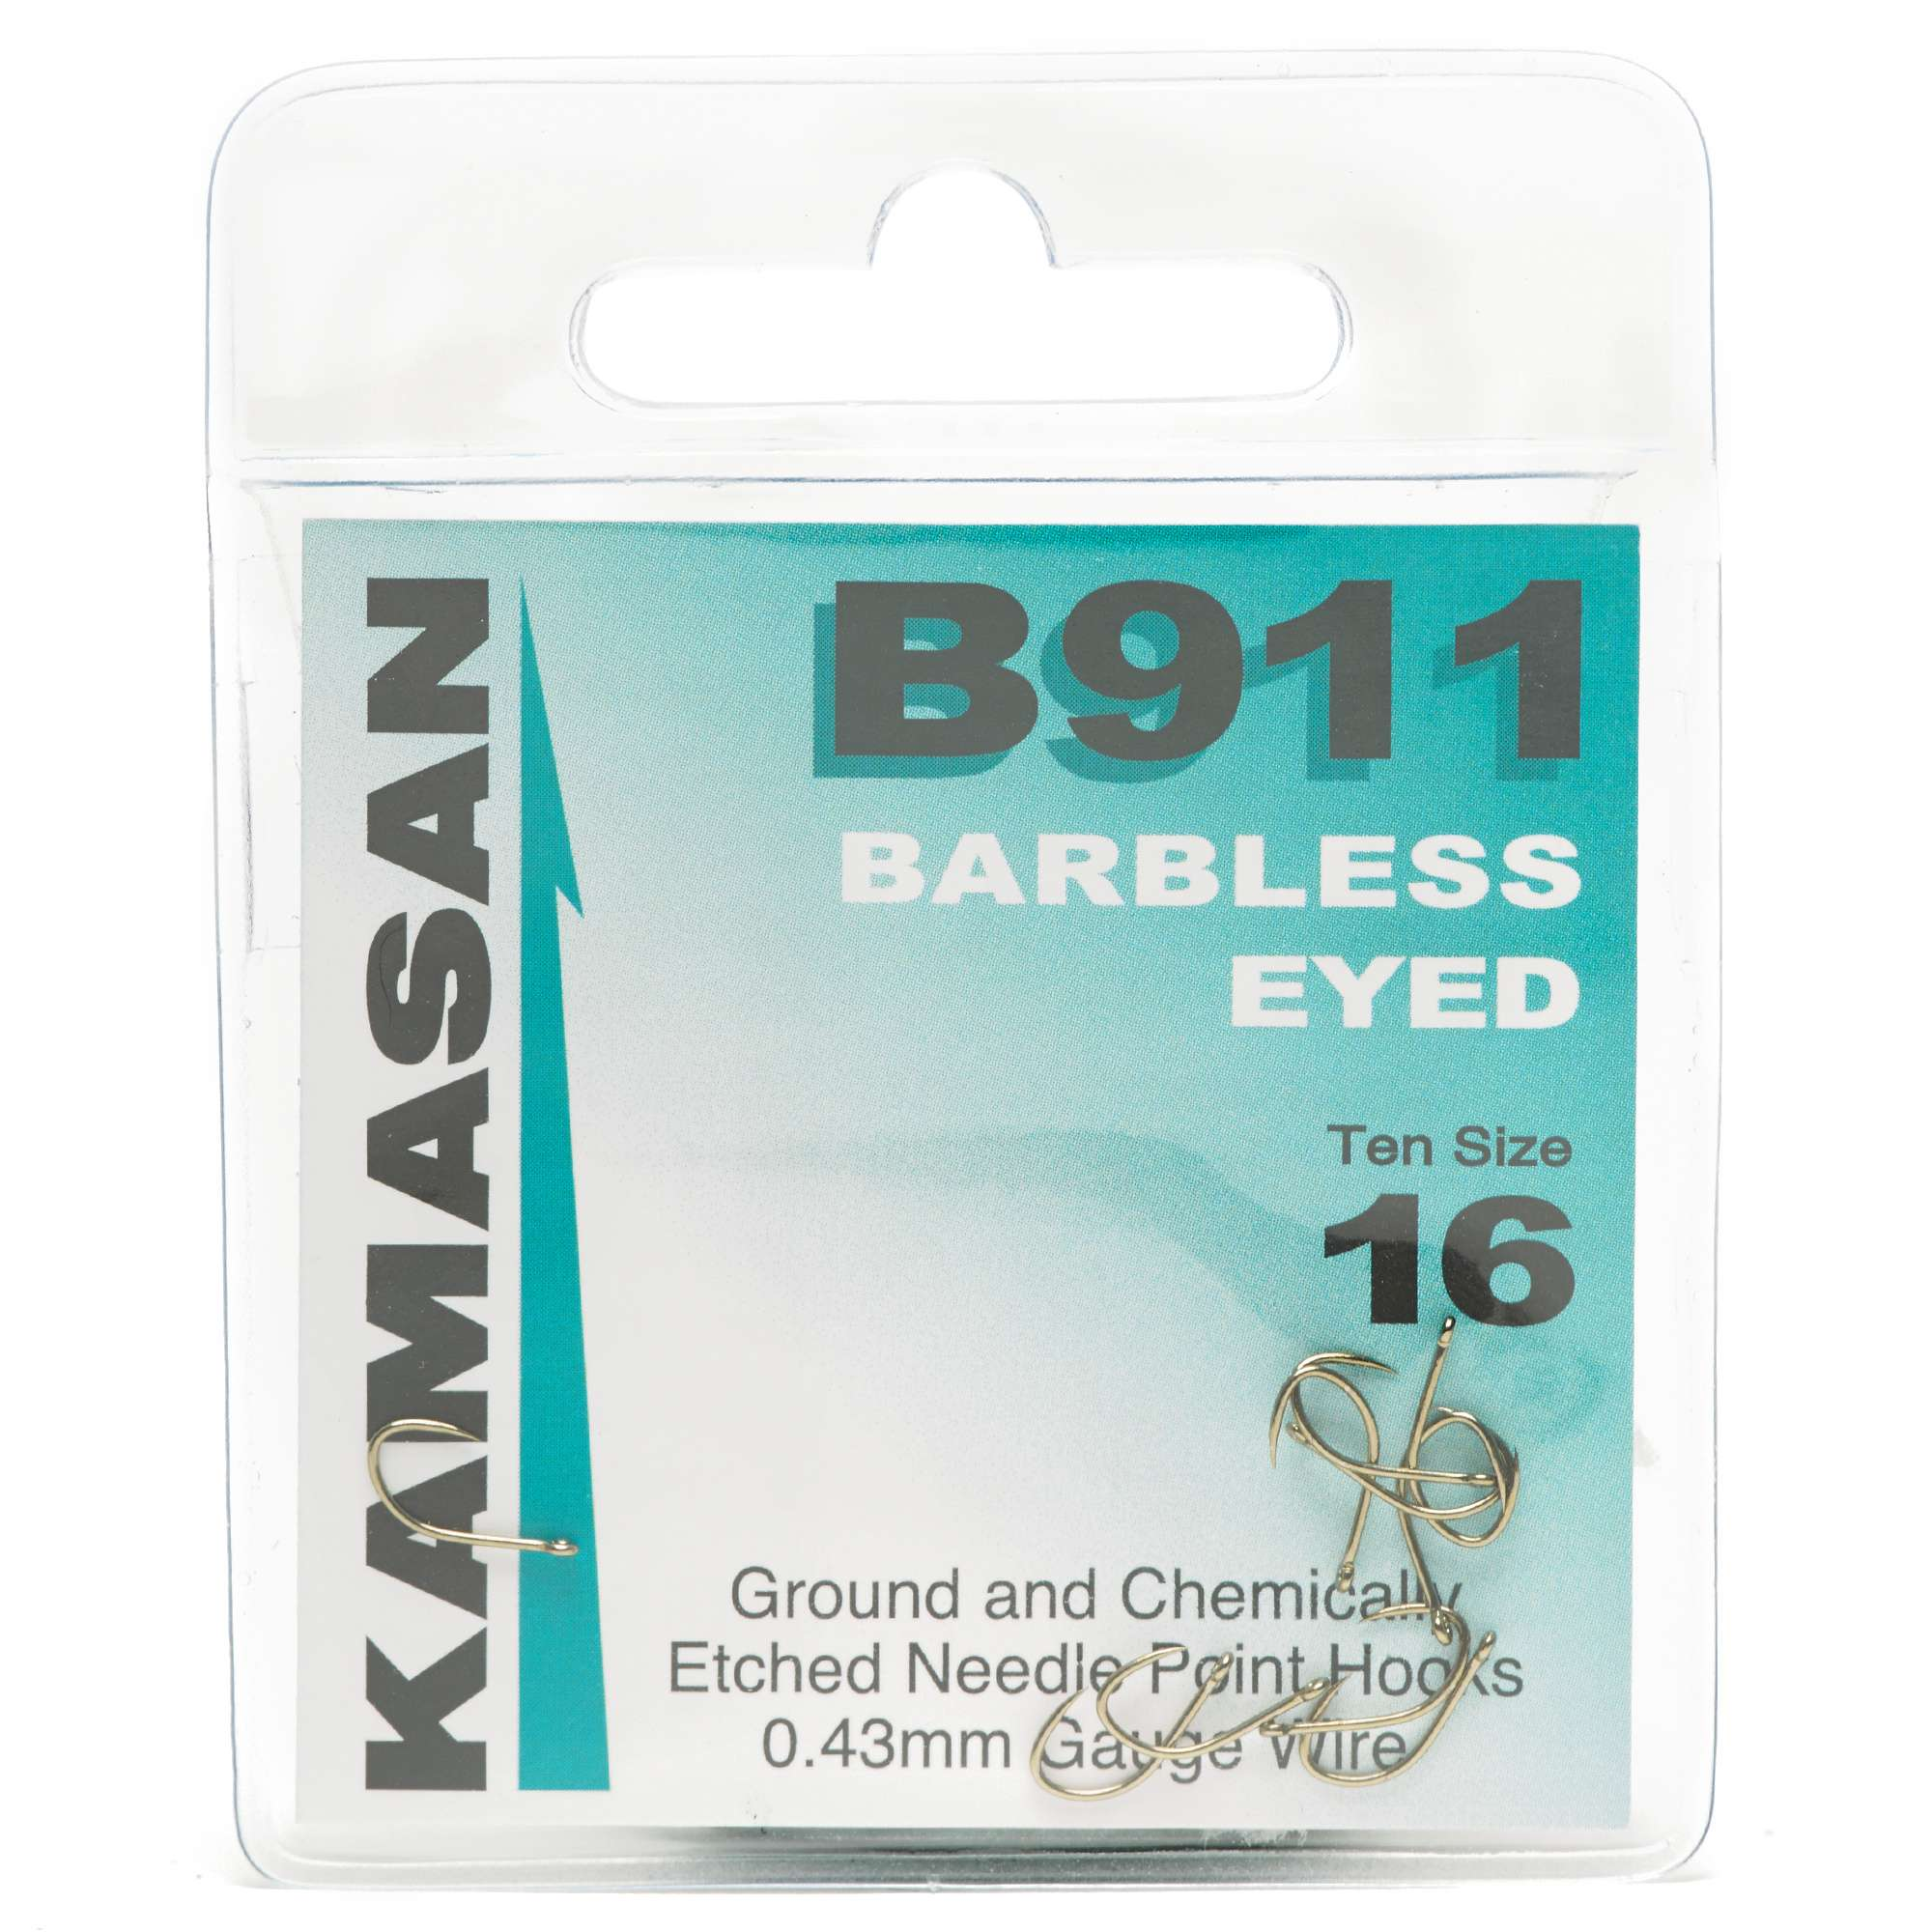 KAMASAN B981 Eyed Barbless Hooks - Size 16